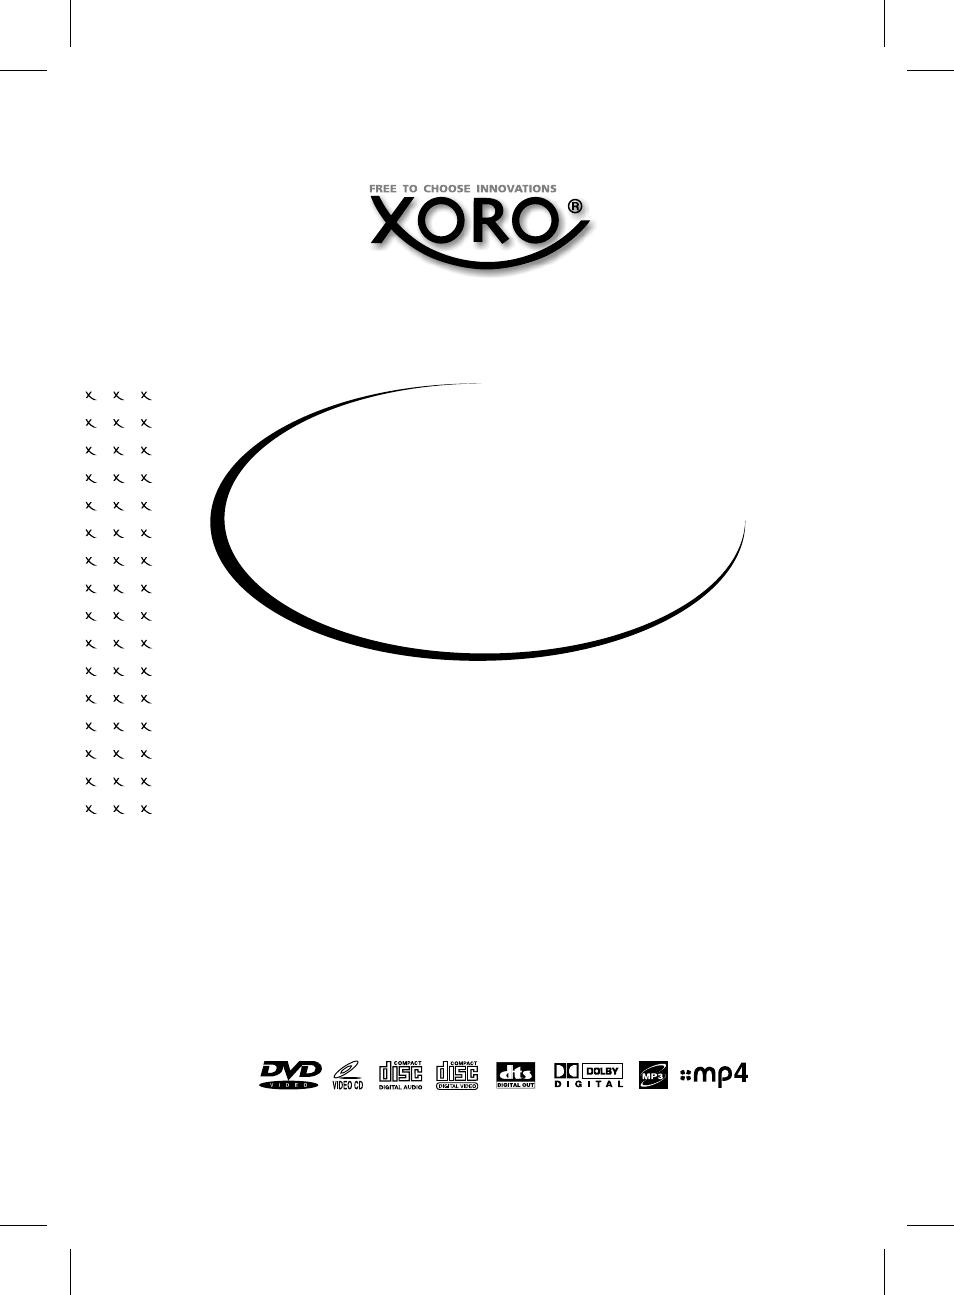 dvd проигрыватель xoro hsd: